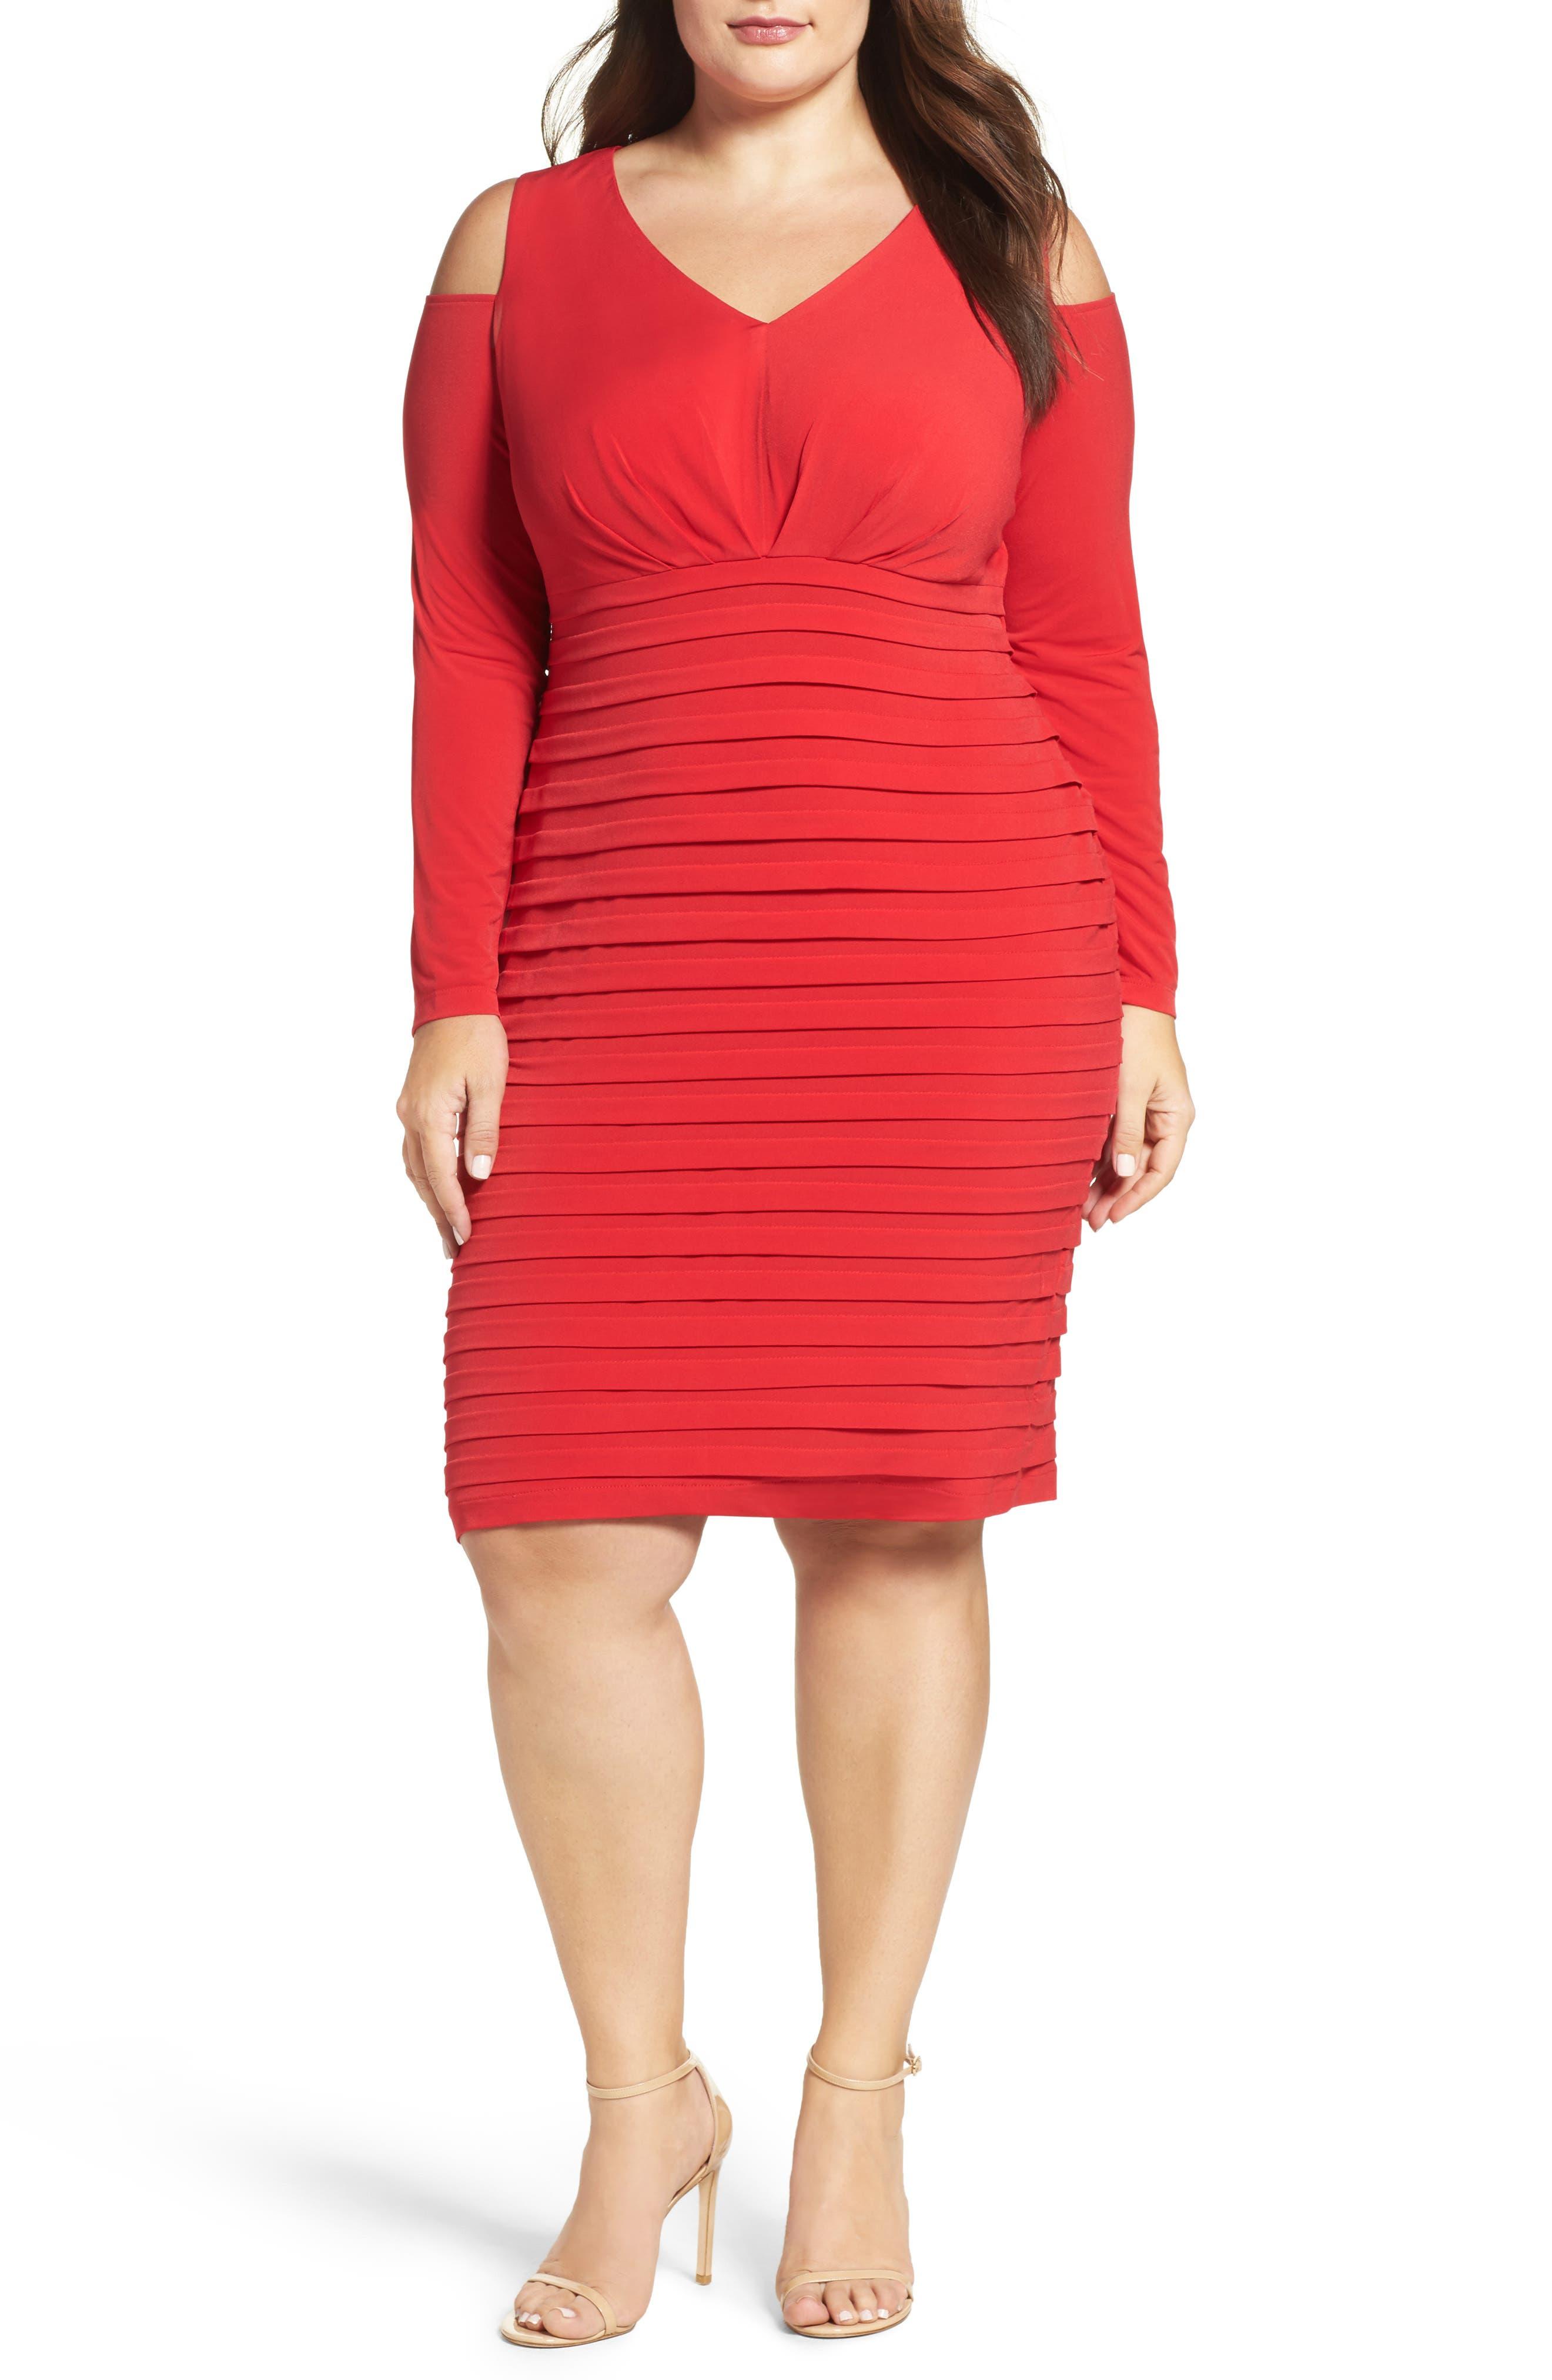 Alternate Image 1 Selected - London Times Cold Shoulder Shutter Pleat Jersey Sheath Dress (Plus Size)